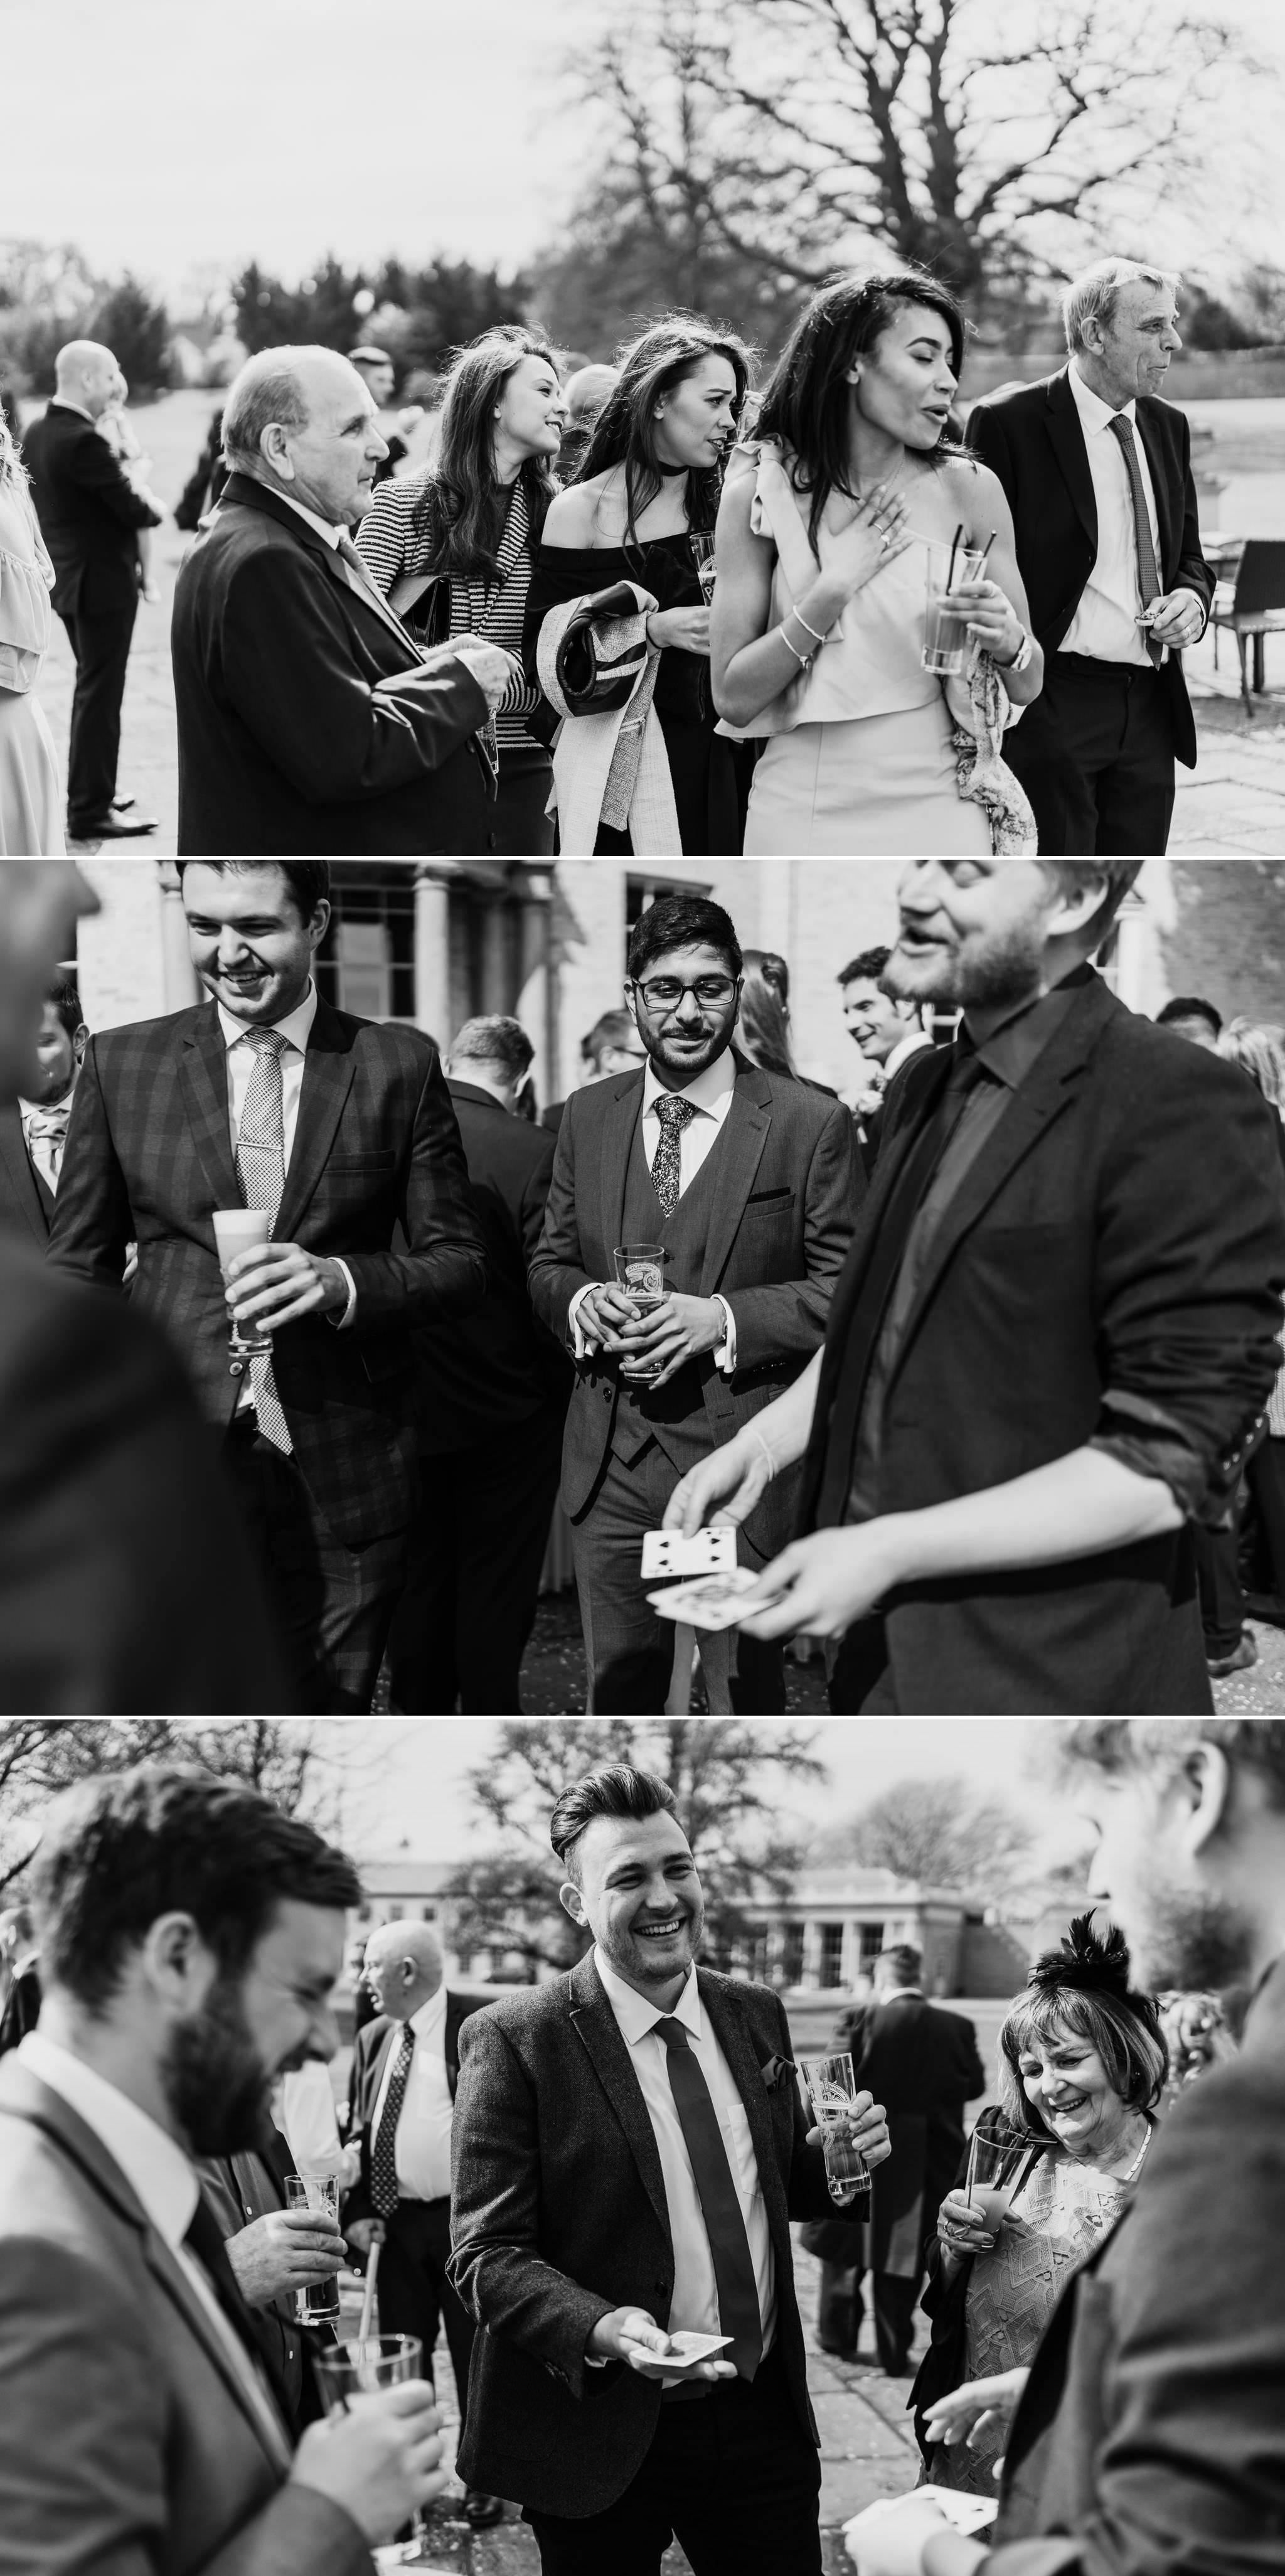 stubton-hall-wedding-photography 12.jpg